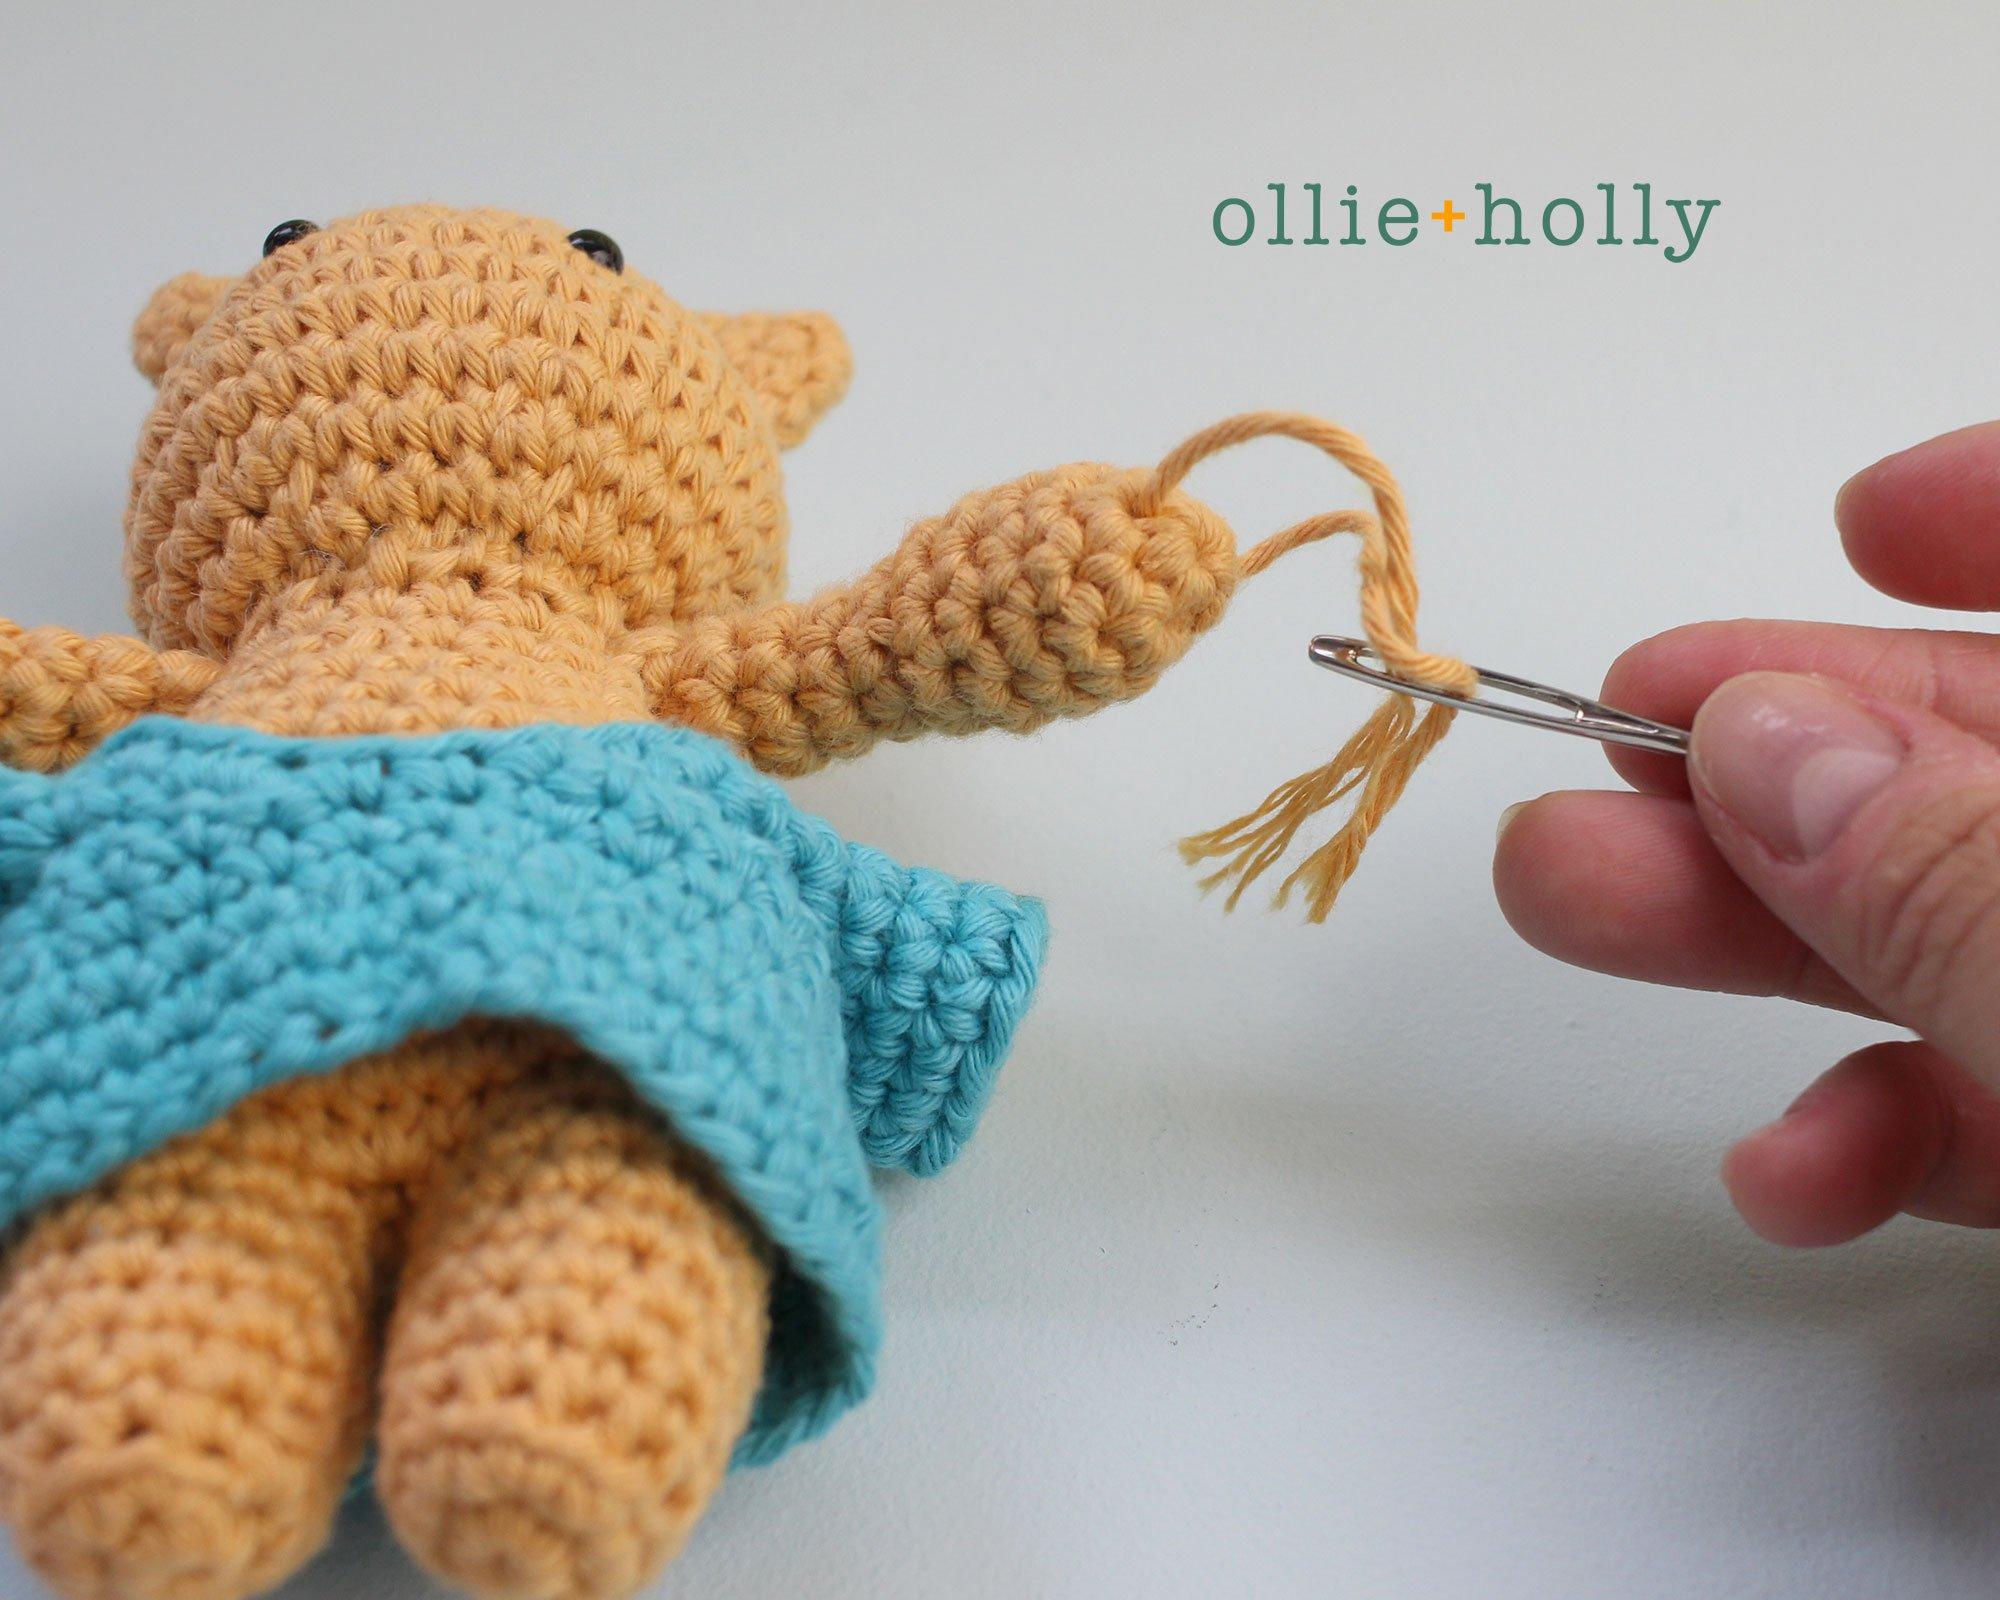 Free Nurse Cat Stuffed Animal Amigurumi Crochet Pattern Step 20